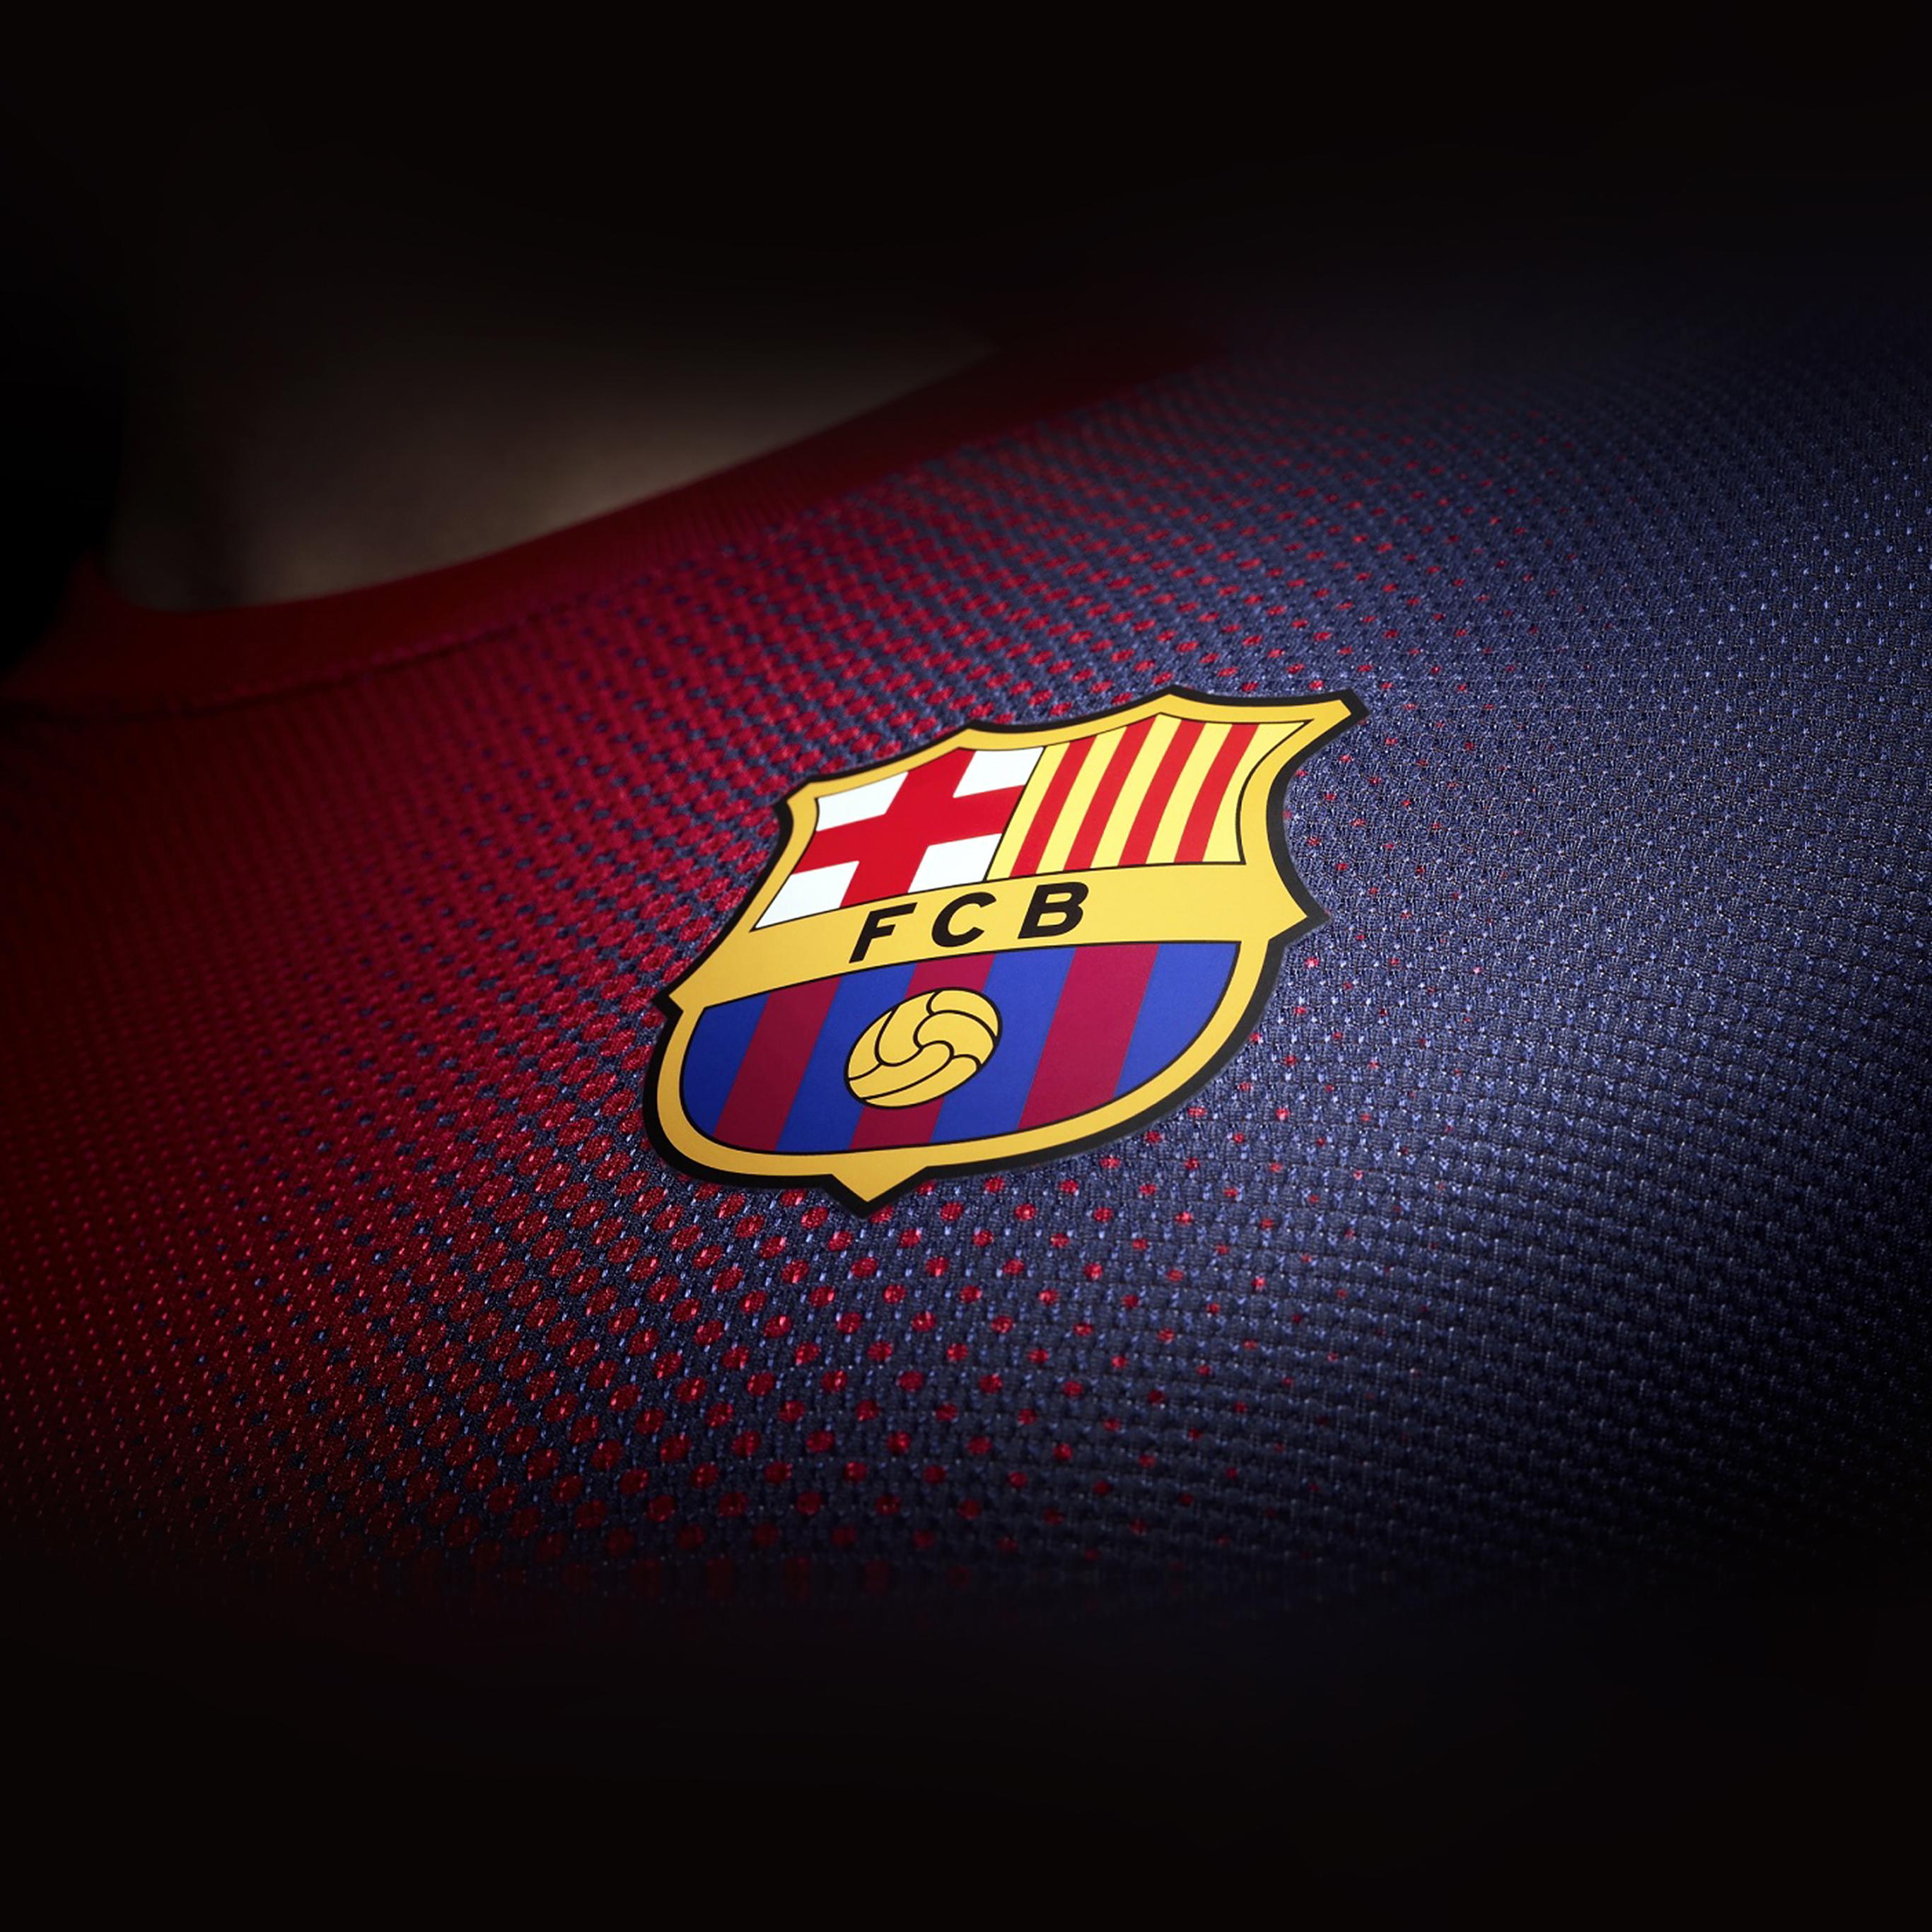 Ac37 Wallpaper Barcelona Logo Emblem Sports Papers